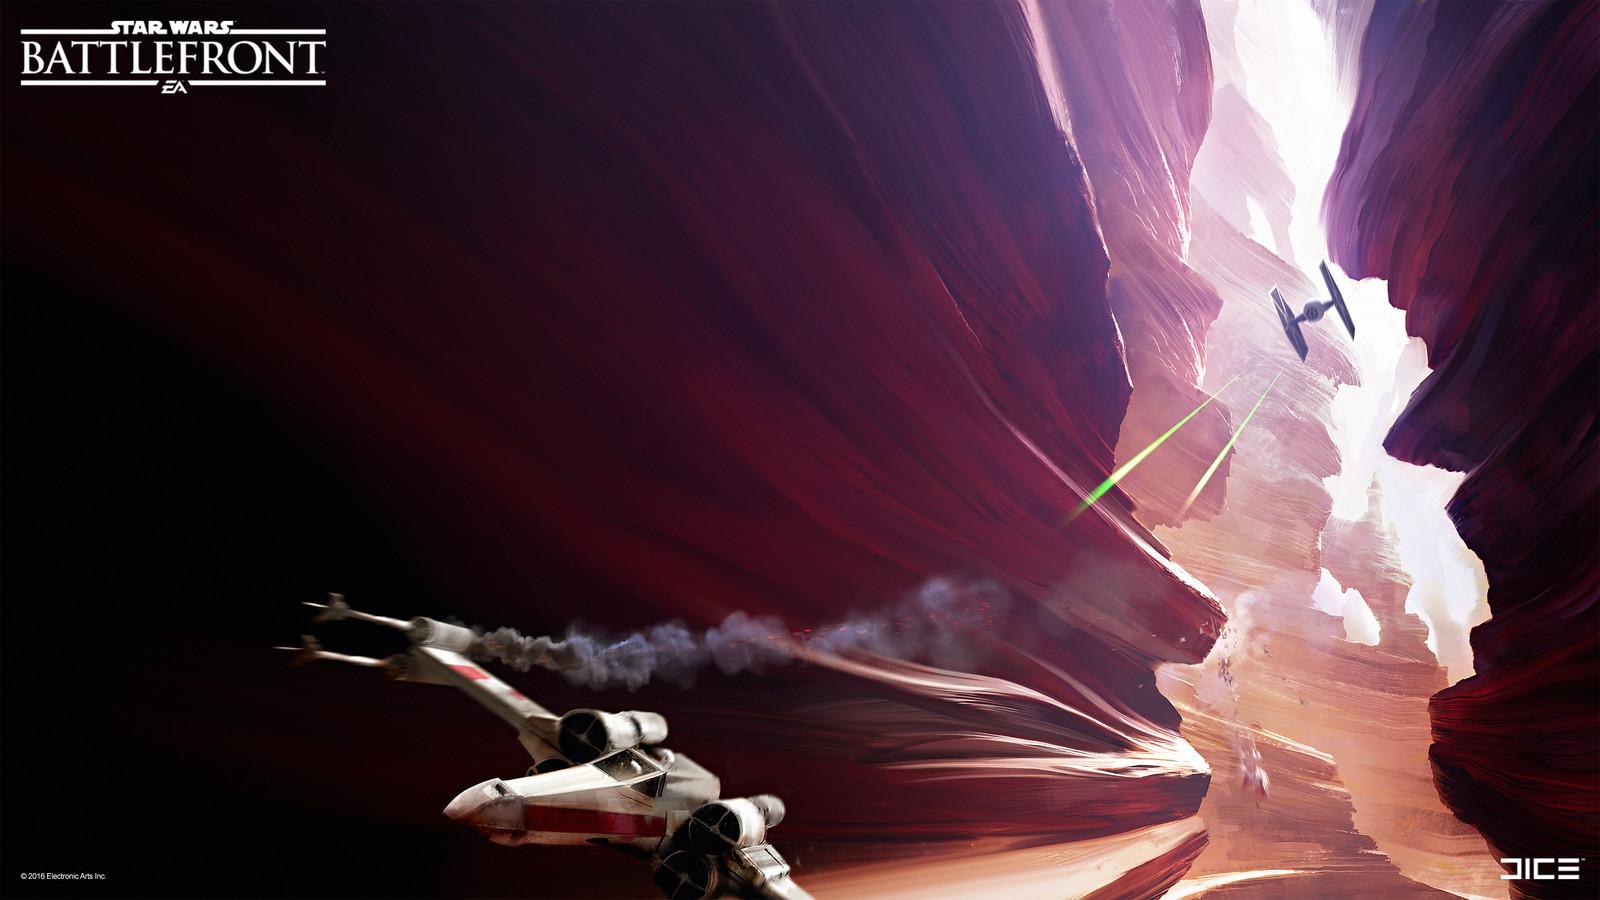 Tatooine Concept Art for the 2015 Star Wars Battlefront game. (2013)